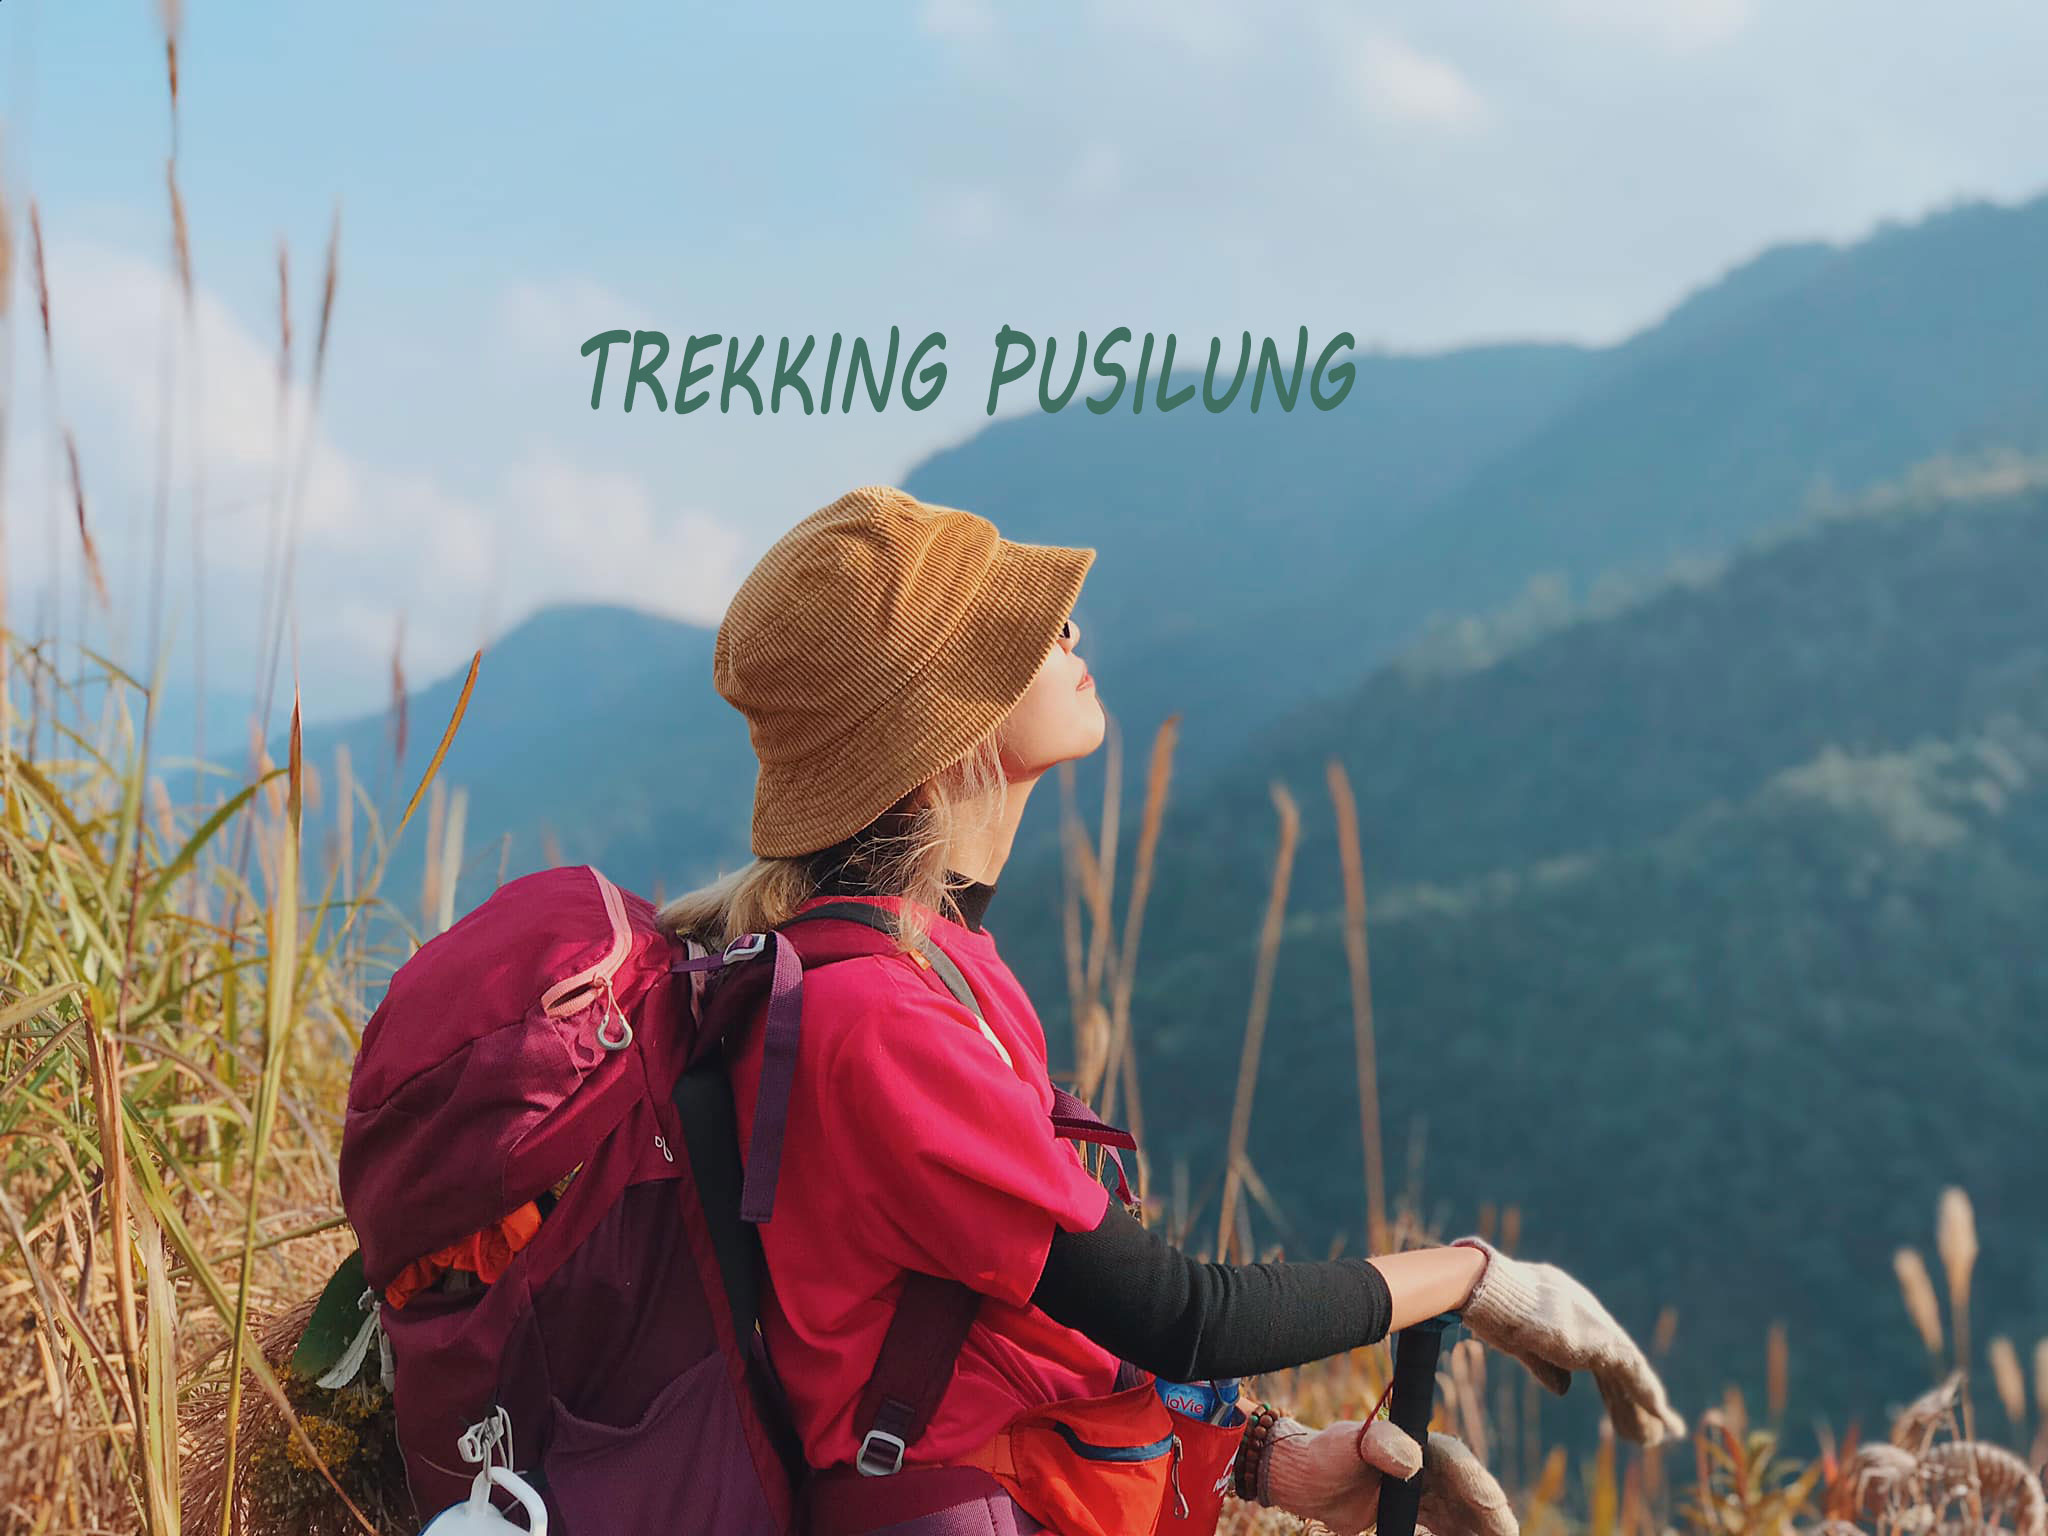 Trekking Pusilung